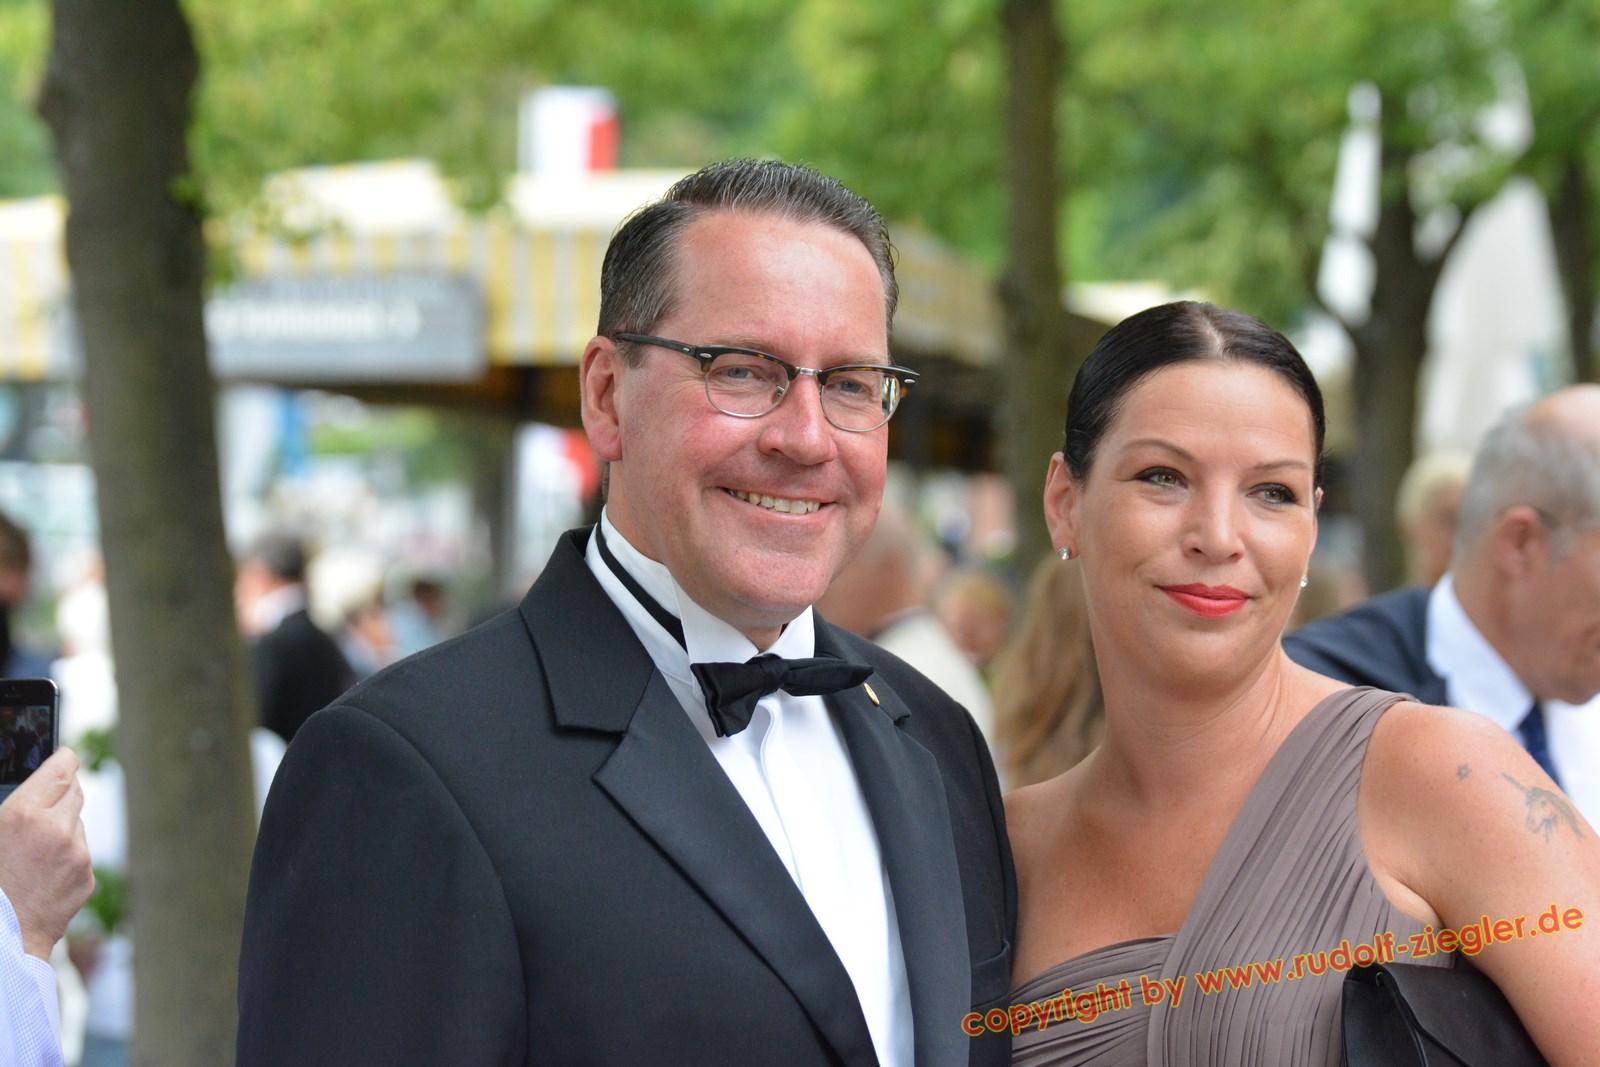 Festspiele Bayreuth - Premiere 148 (1600x1200)